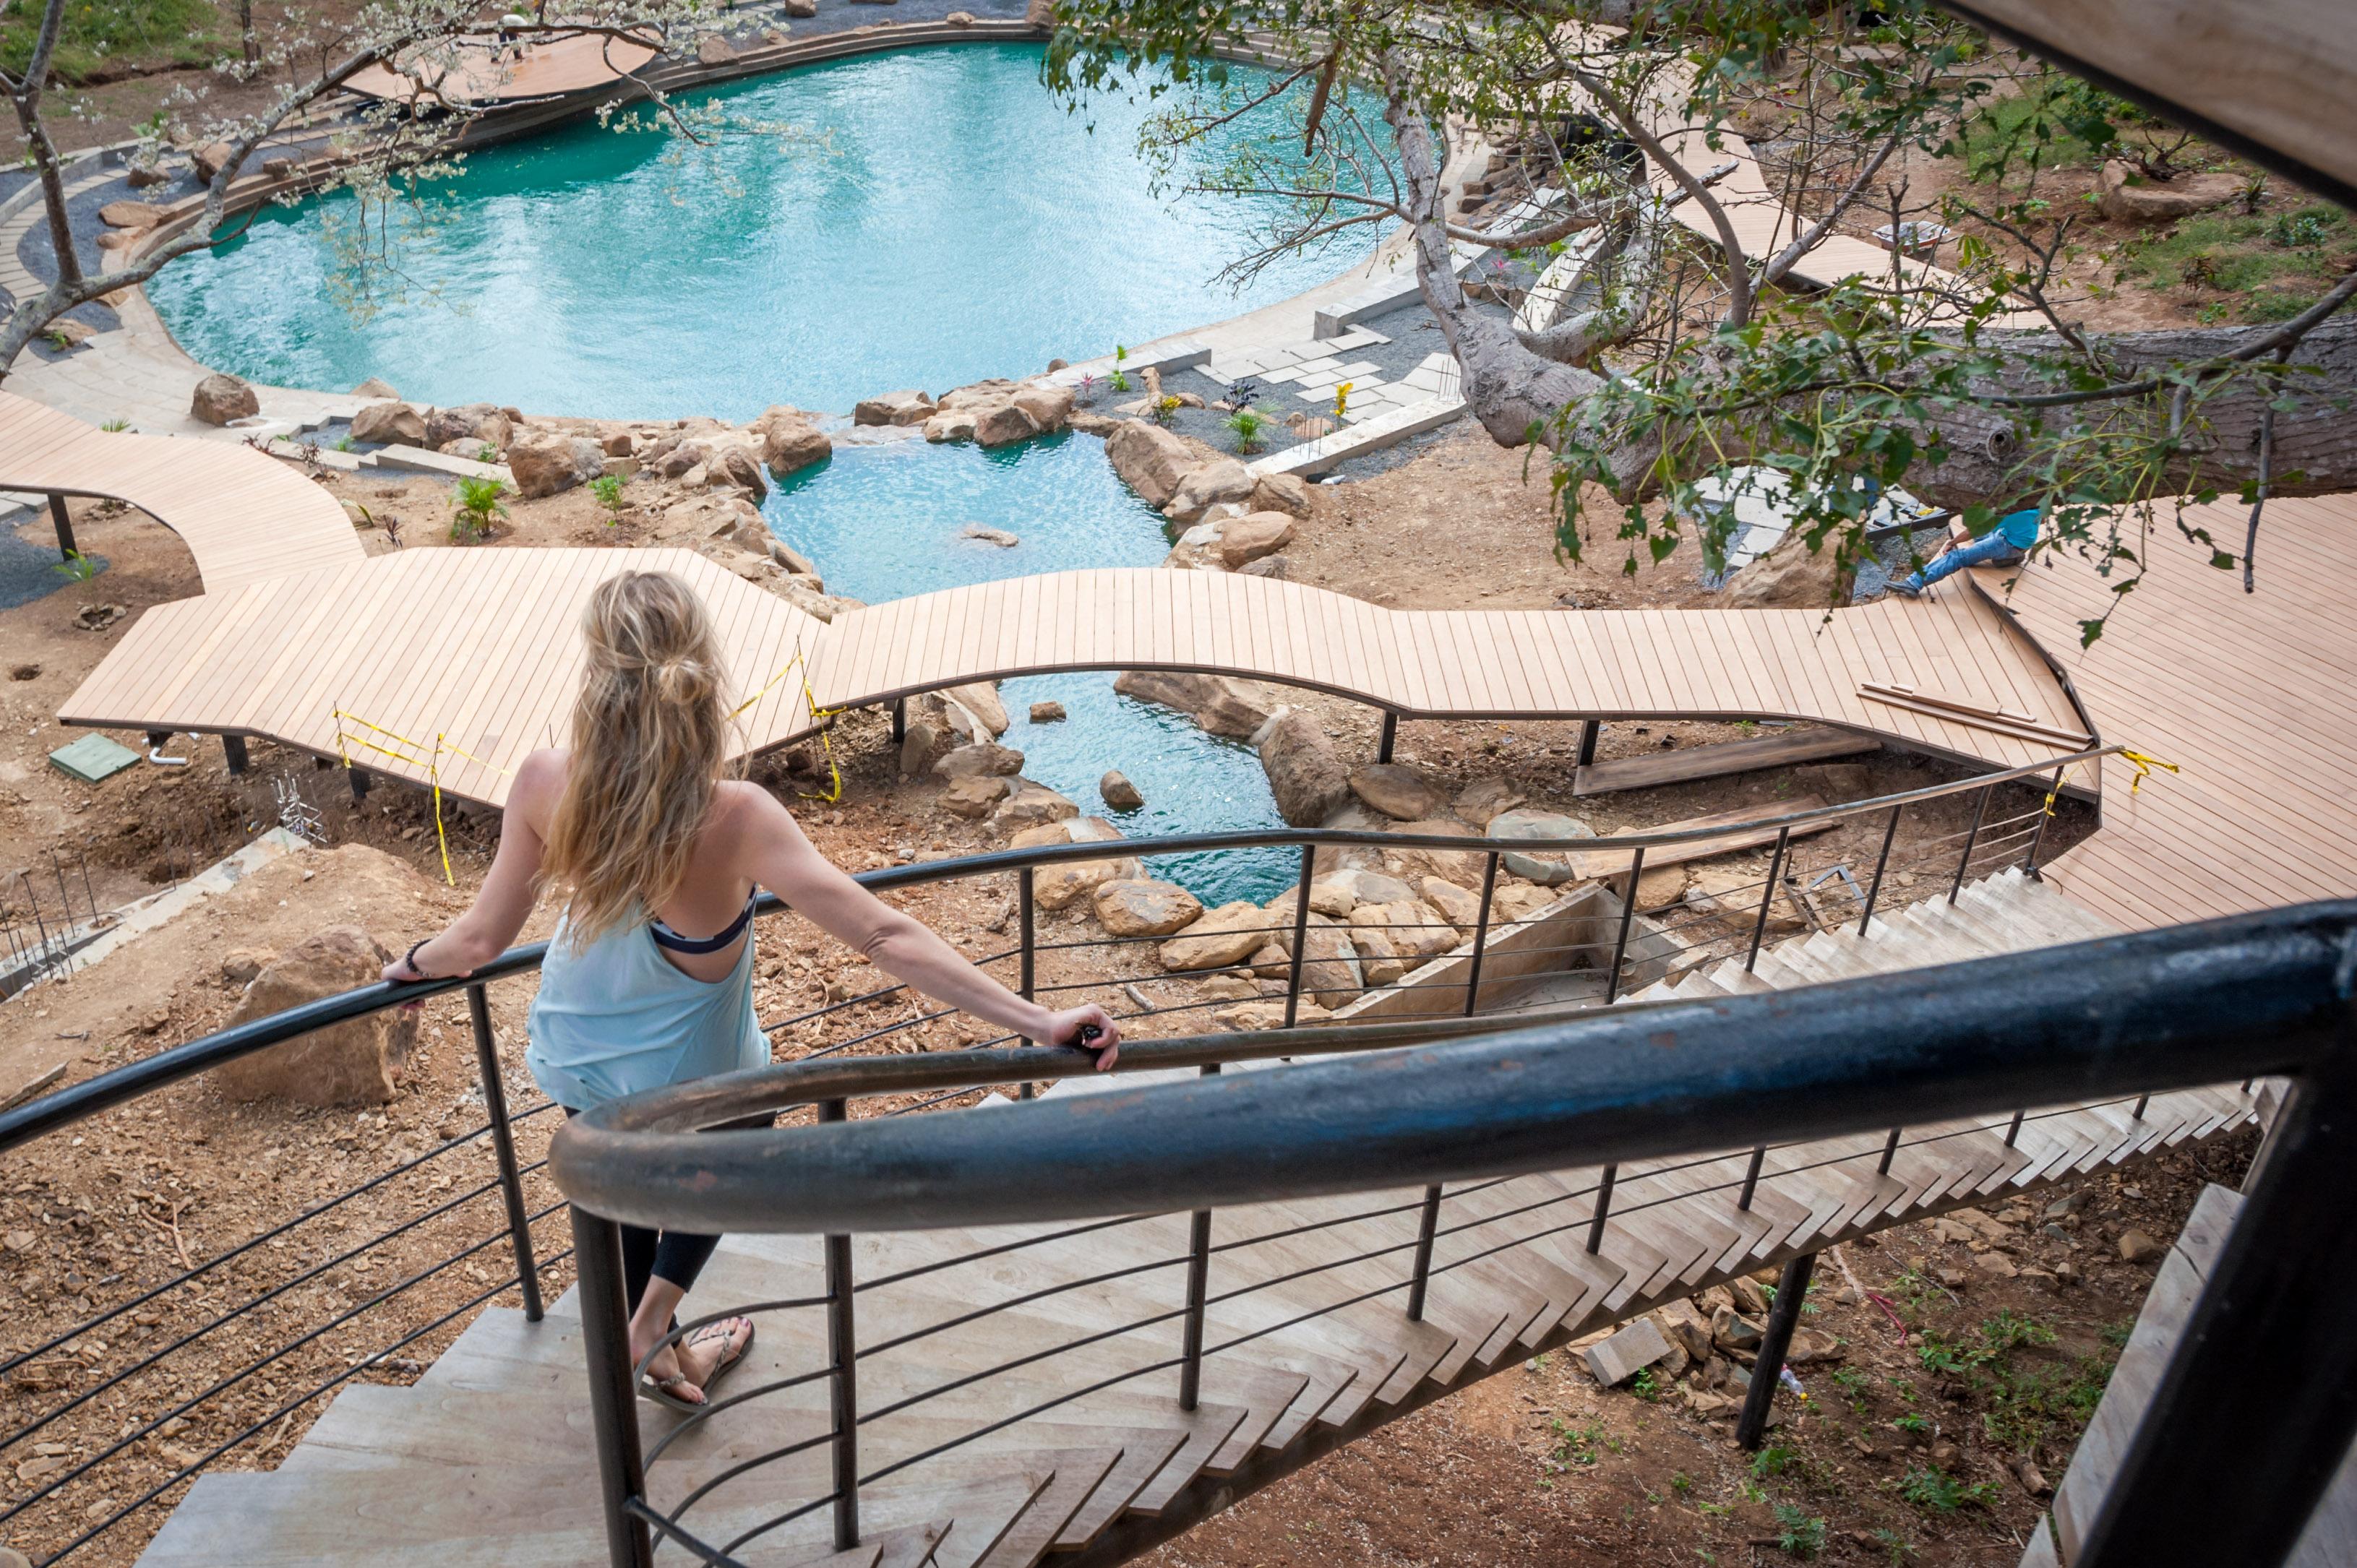 Celebration of Yoga –  Yoga Retreat with Celebration Travel and Healing Movements Yoga Centre at the Tree House Resort Nov. 4 – Nov. 11, 2017